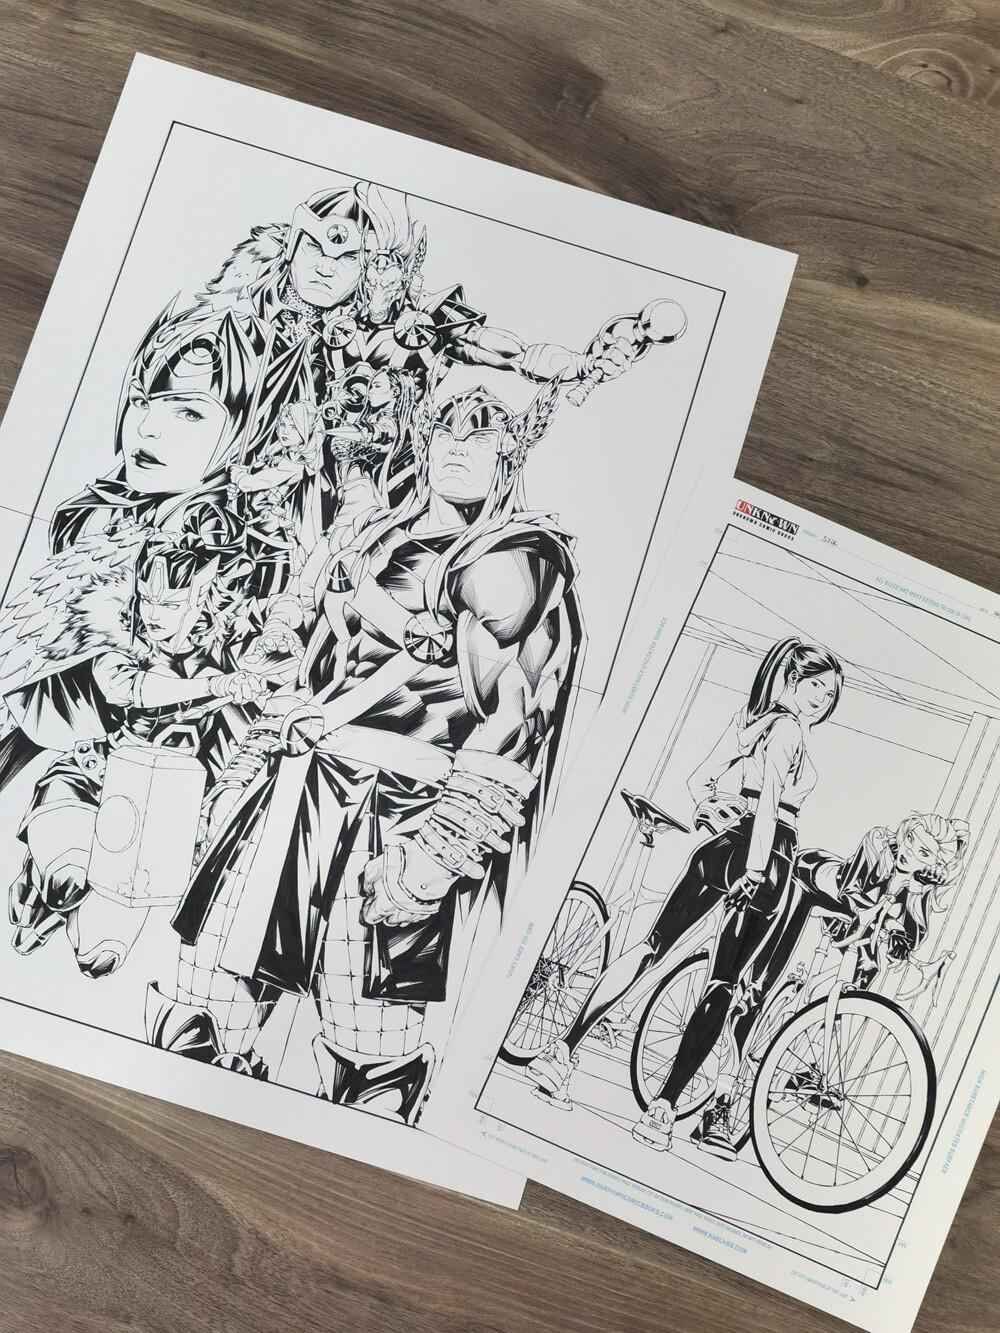 Thor and Silk original art size comparison. Thor (16x23) and Silk (11x17)